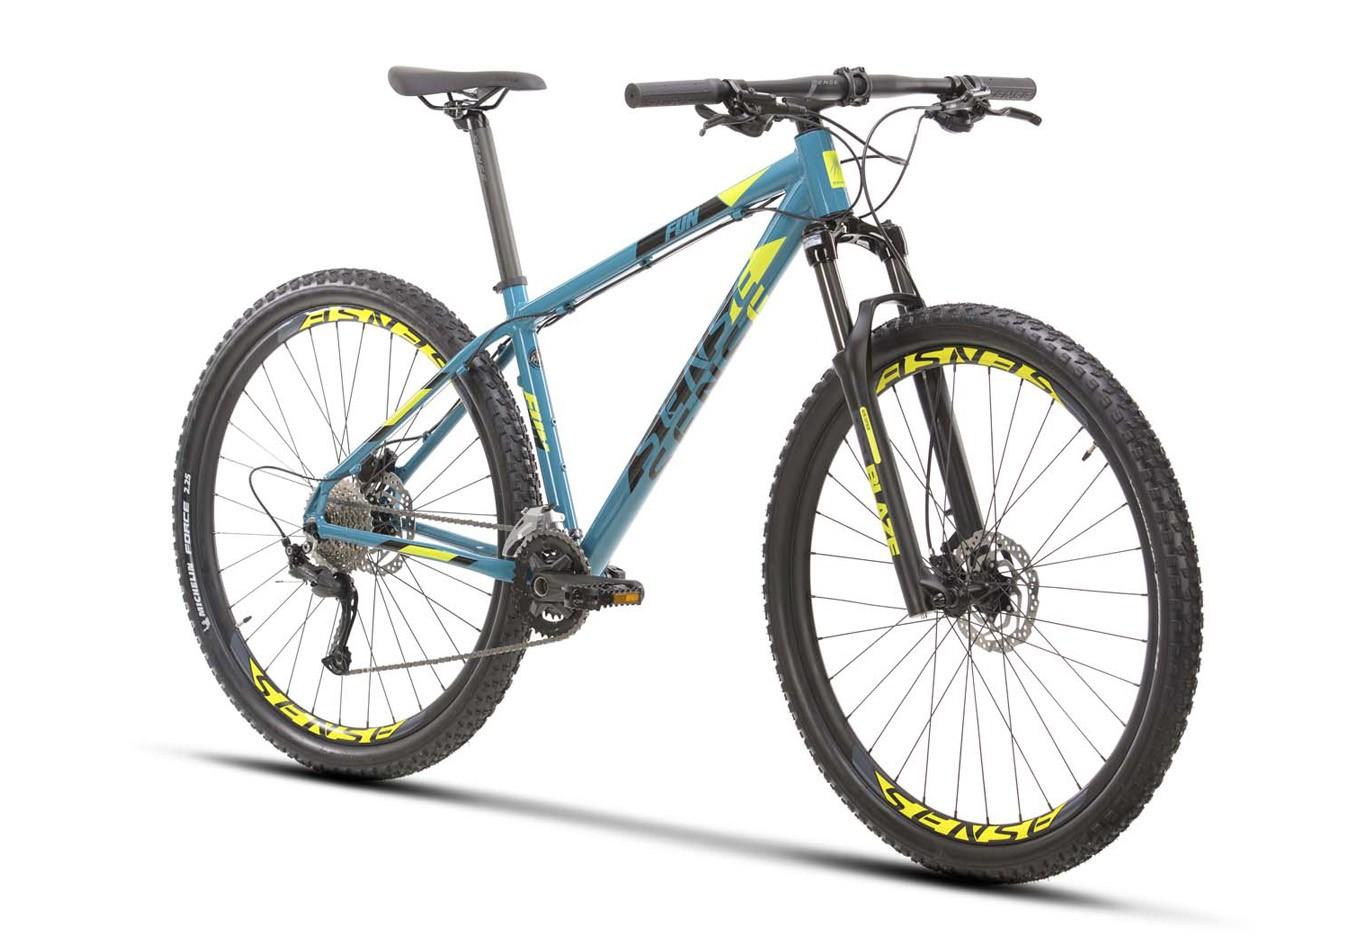 BICICLETA 29 SENSE FUN EVO SHIMANO 2X9 VEL ACQUA/AMARELO (2021)